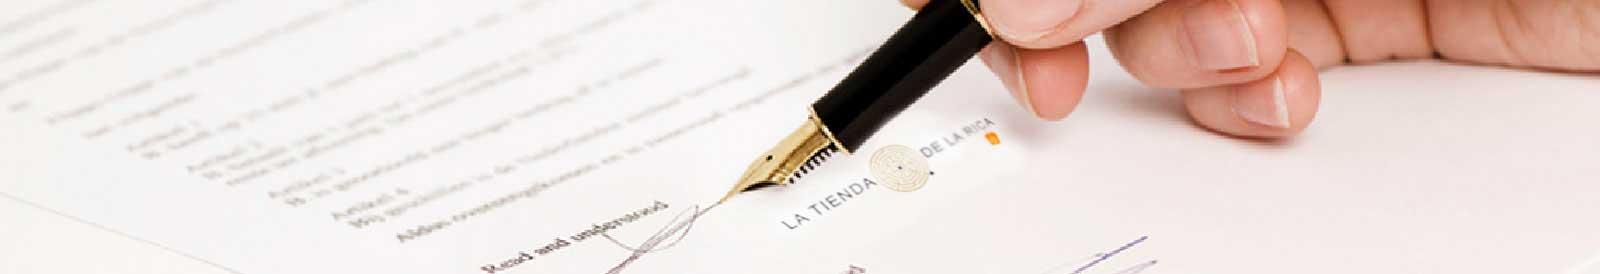 Cabecera información legal LTDLR